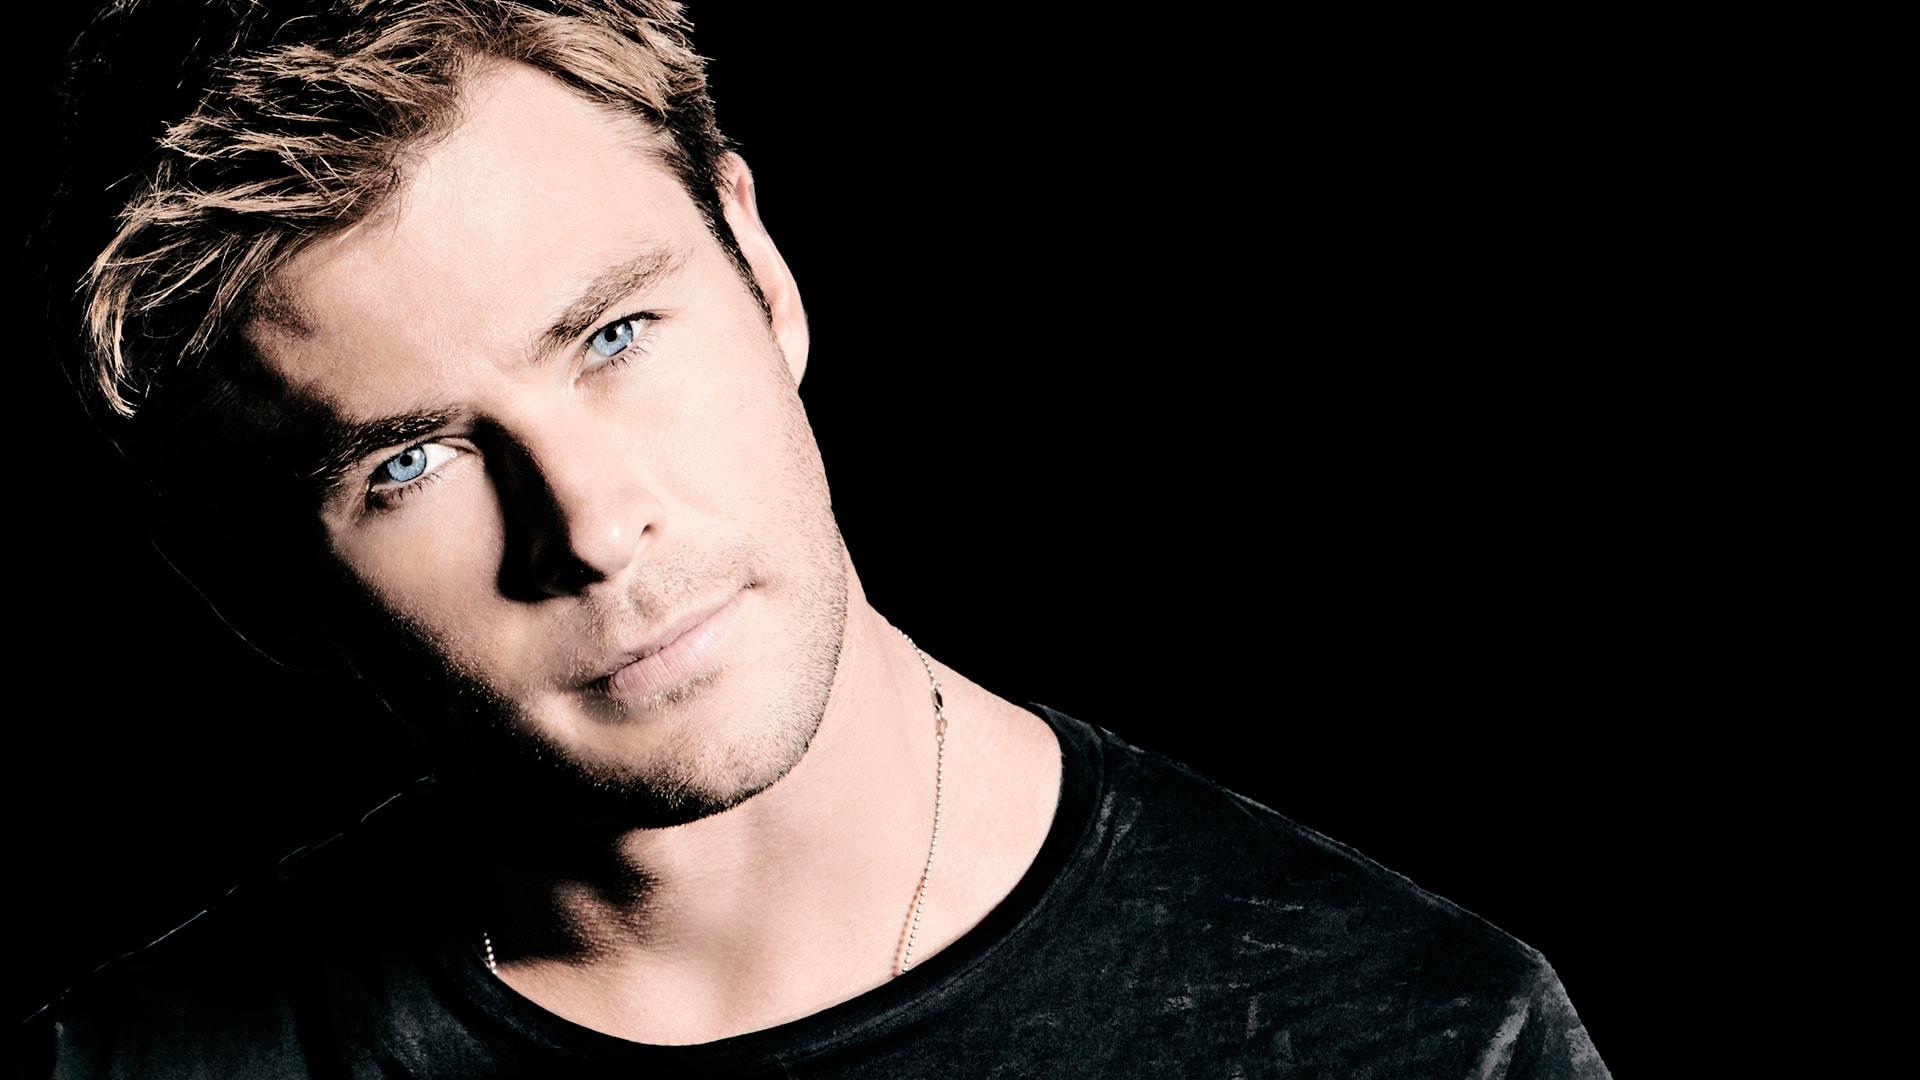 Chris Hemsworth Backgrounds